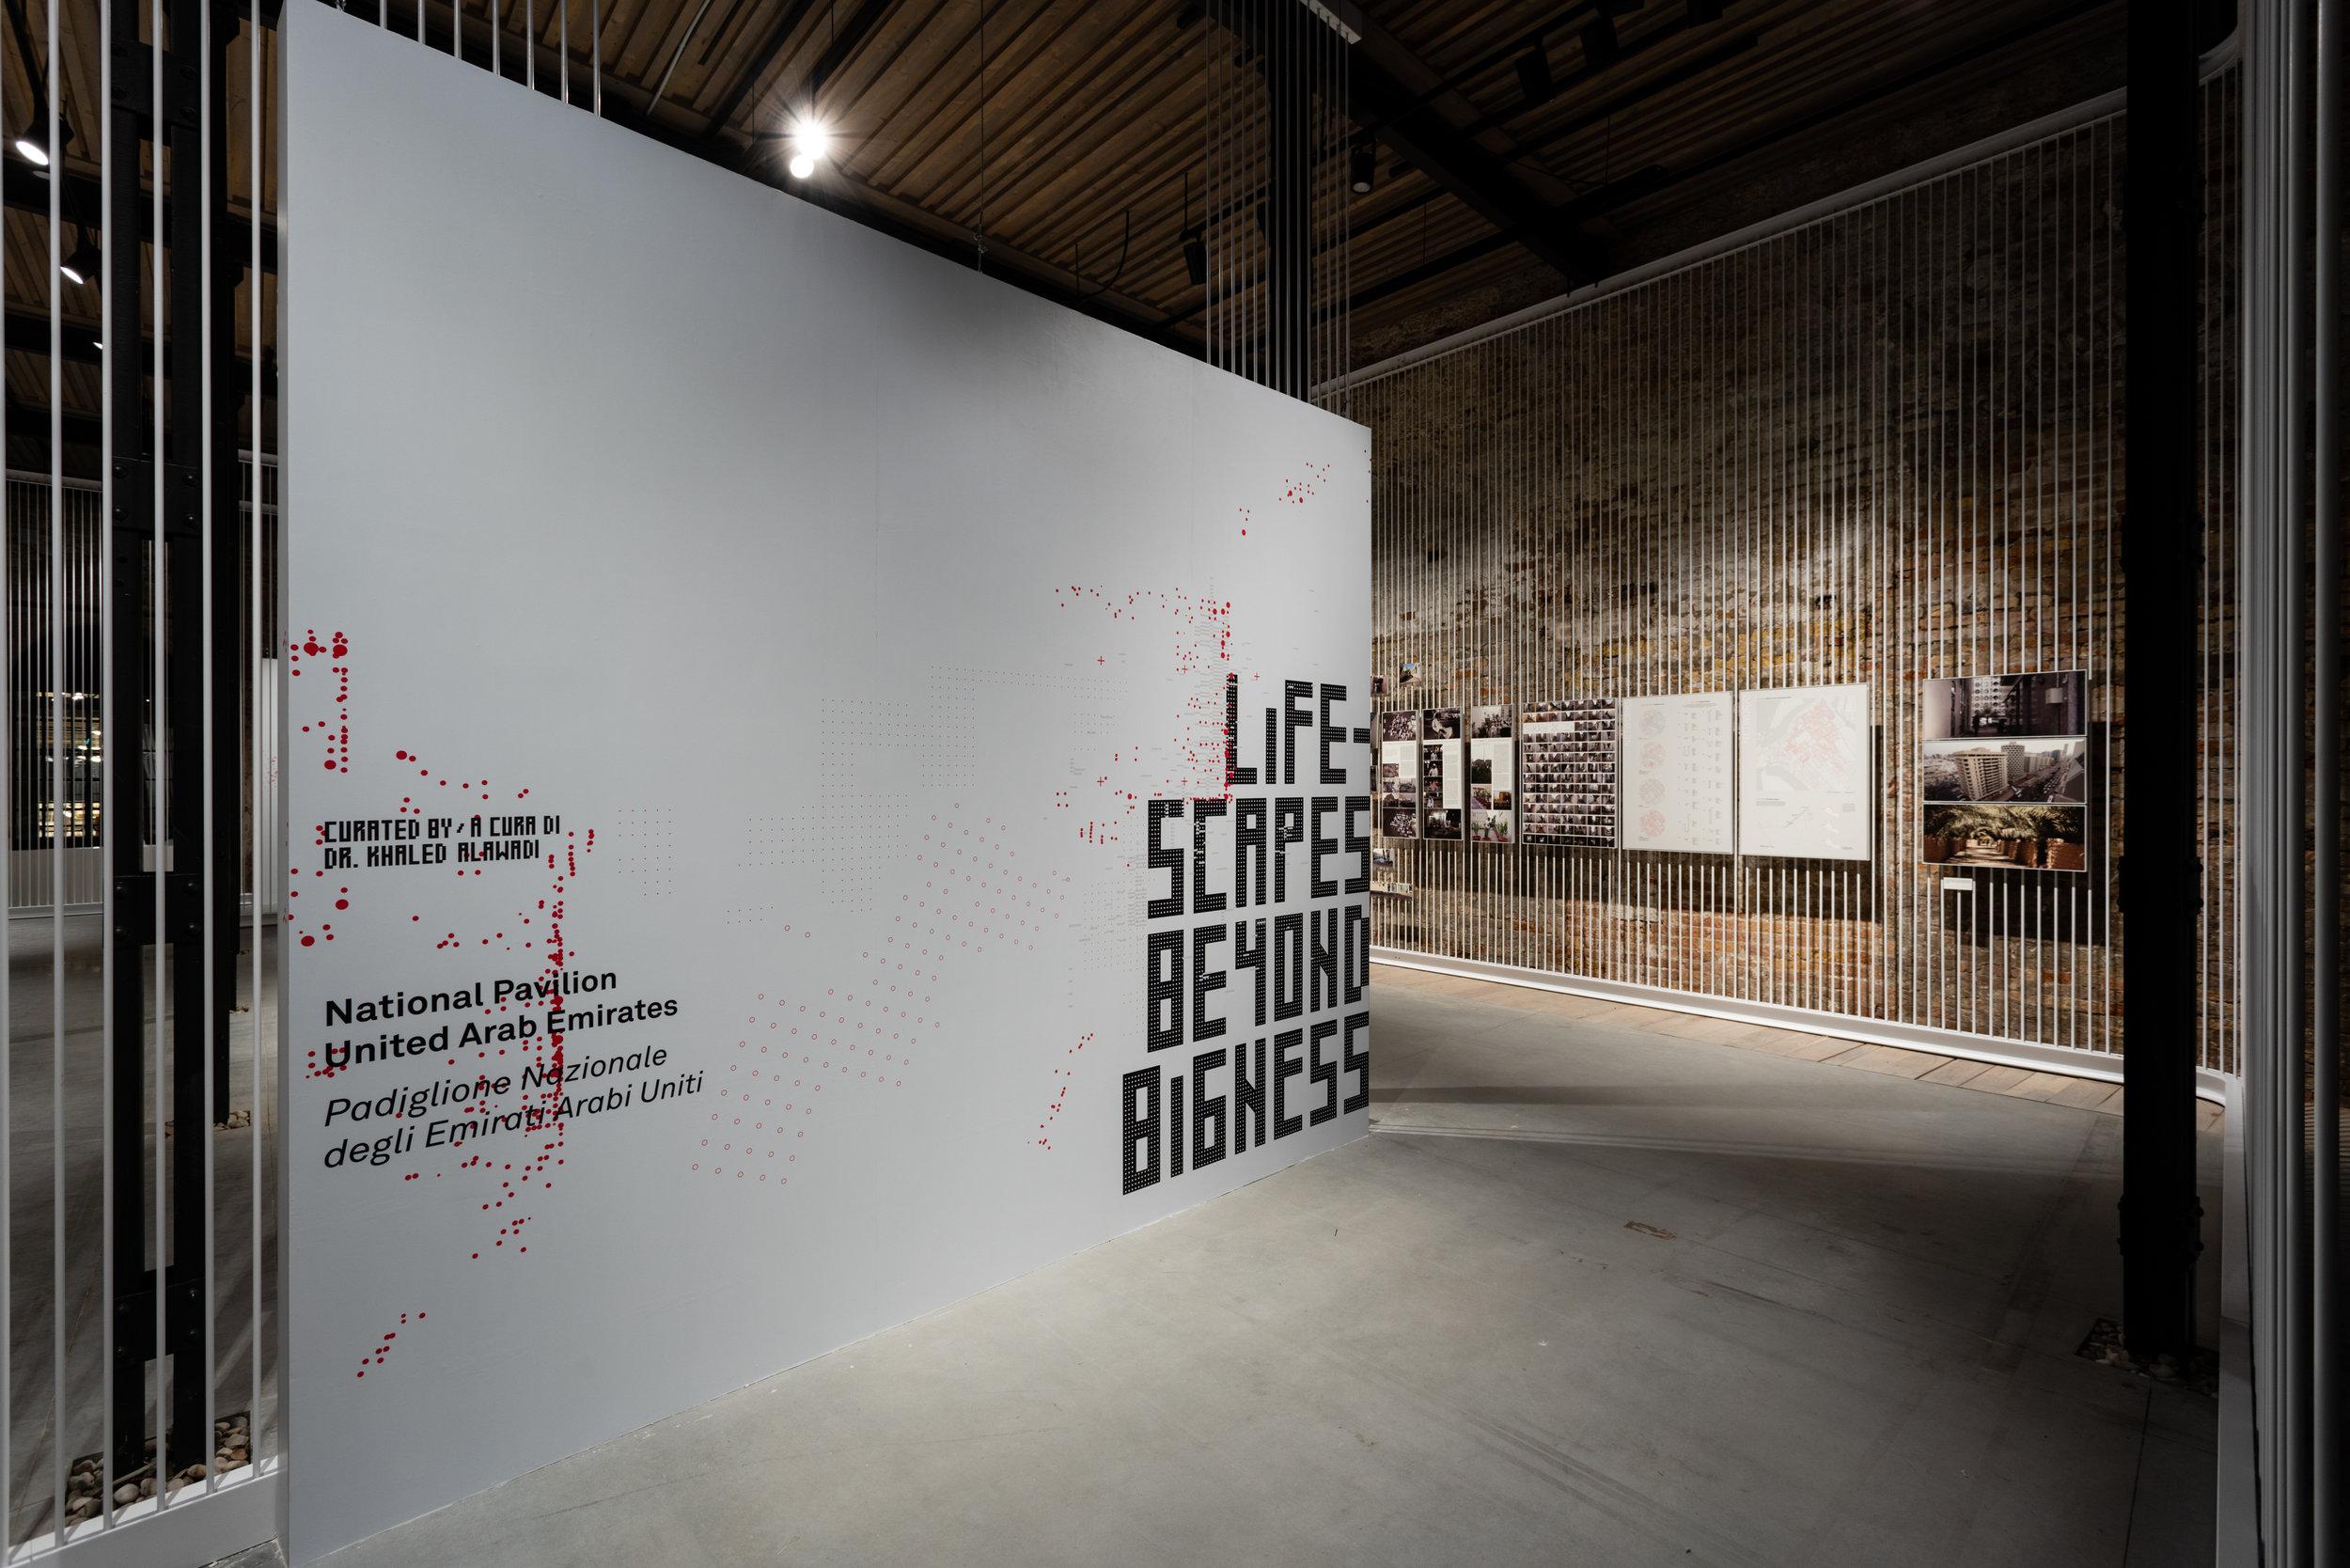 Lifescapes Beyond Bigness. The UAE's 2018 Pavilion for the International Architecture Exhibition at the Venice Biennale. Courtesy National Pavilion UAE.